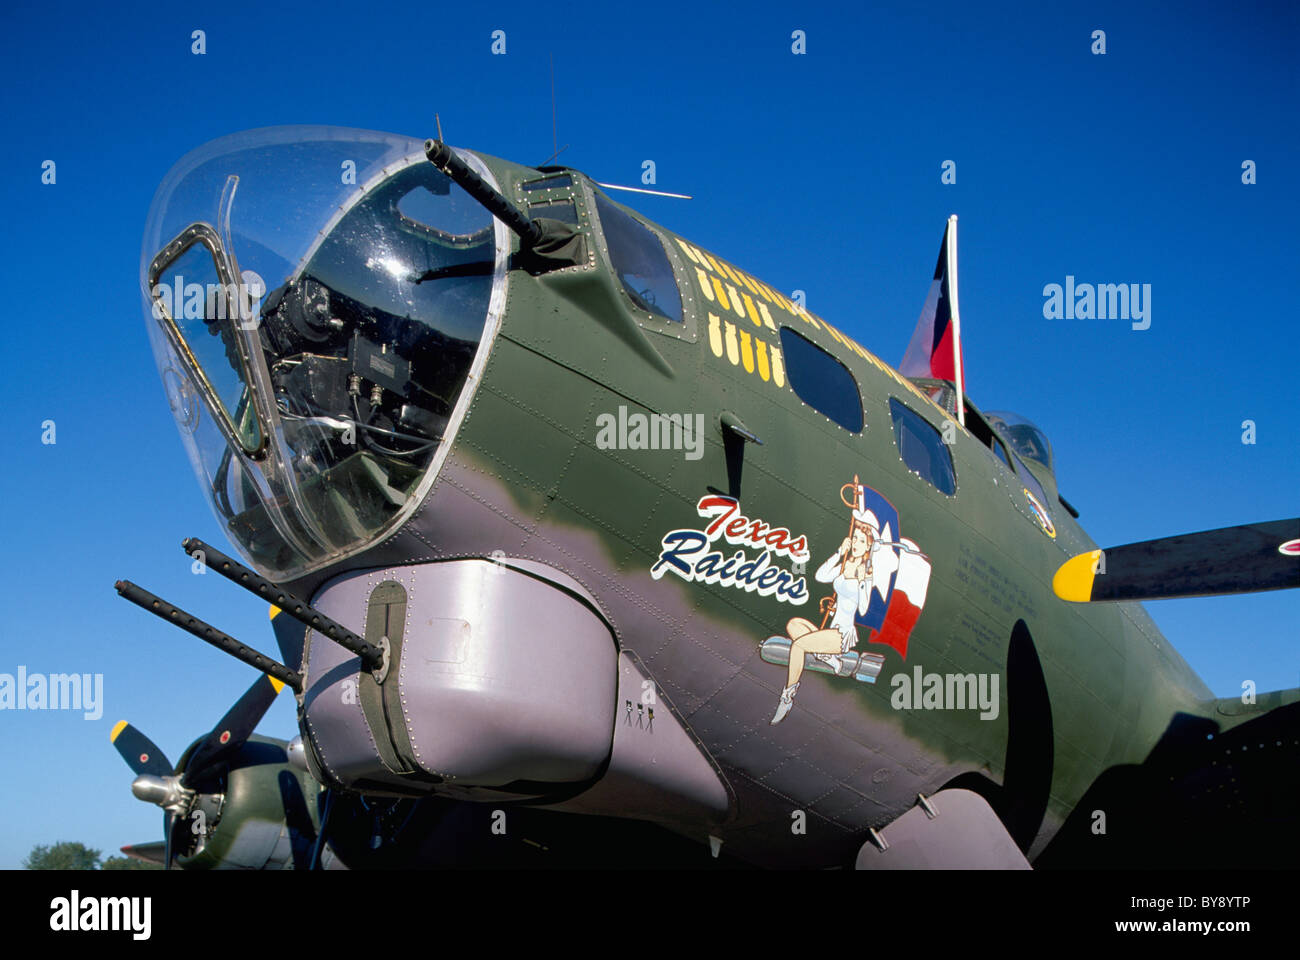 "Boeing B-17G Flying Fortress, Abbotsford International Airshow, BC, British Columbia, Canada - ""Texas Raiders"" on Stock Photo"